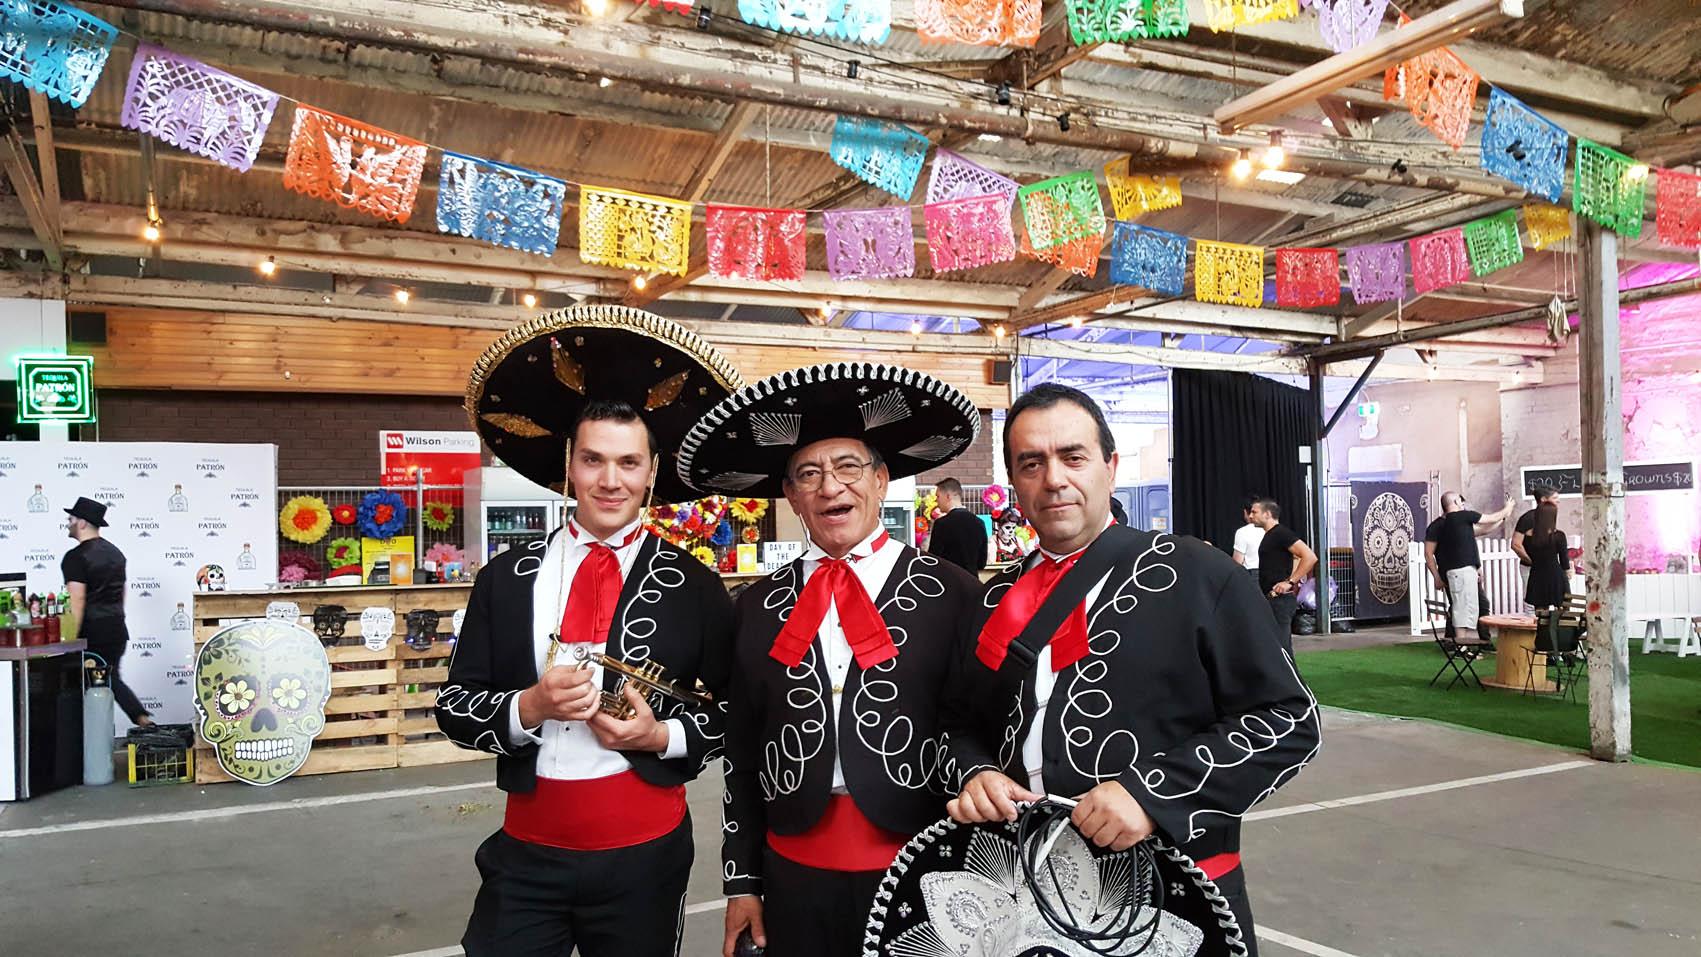 halifax-street-mexican-mariachi-dady-of-the-dea-australia-party